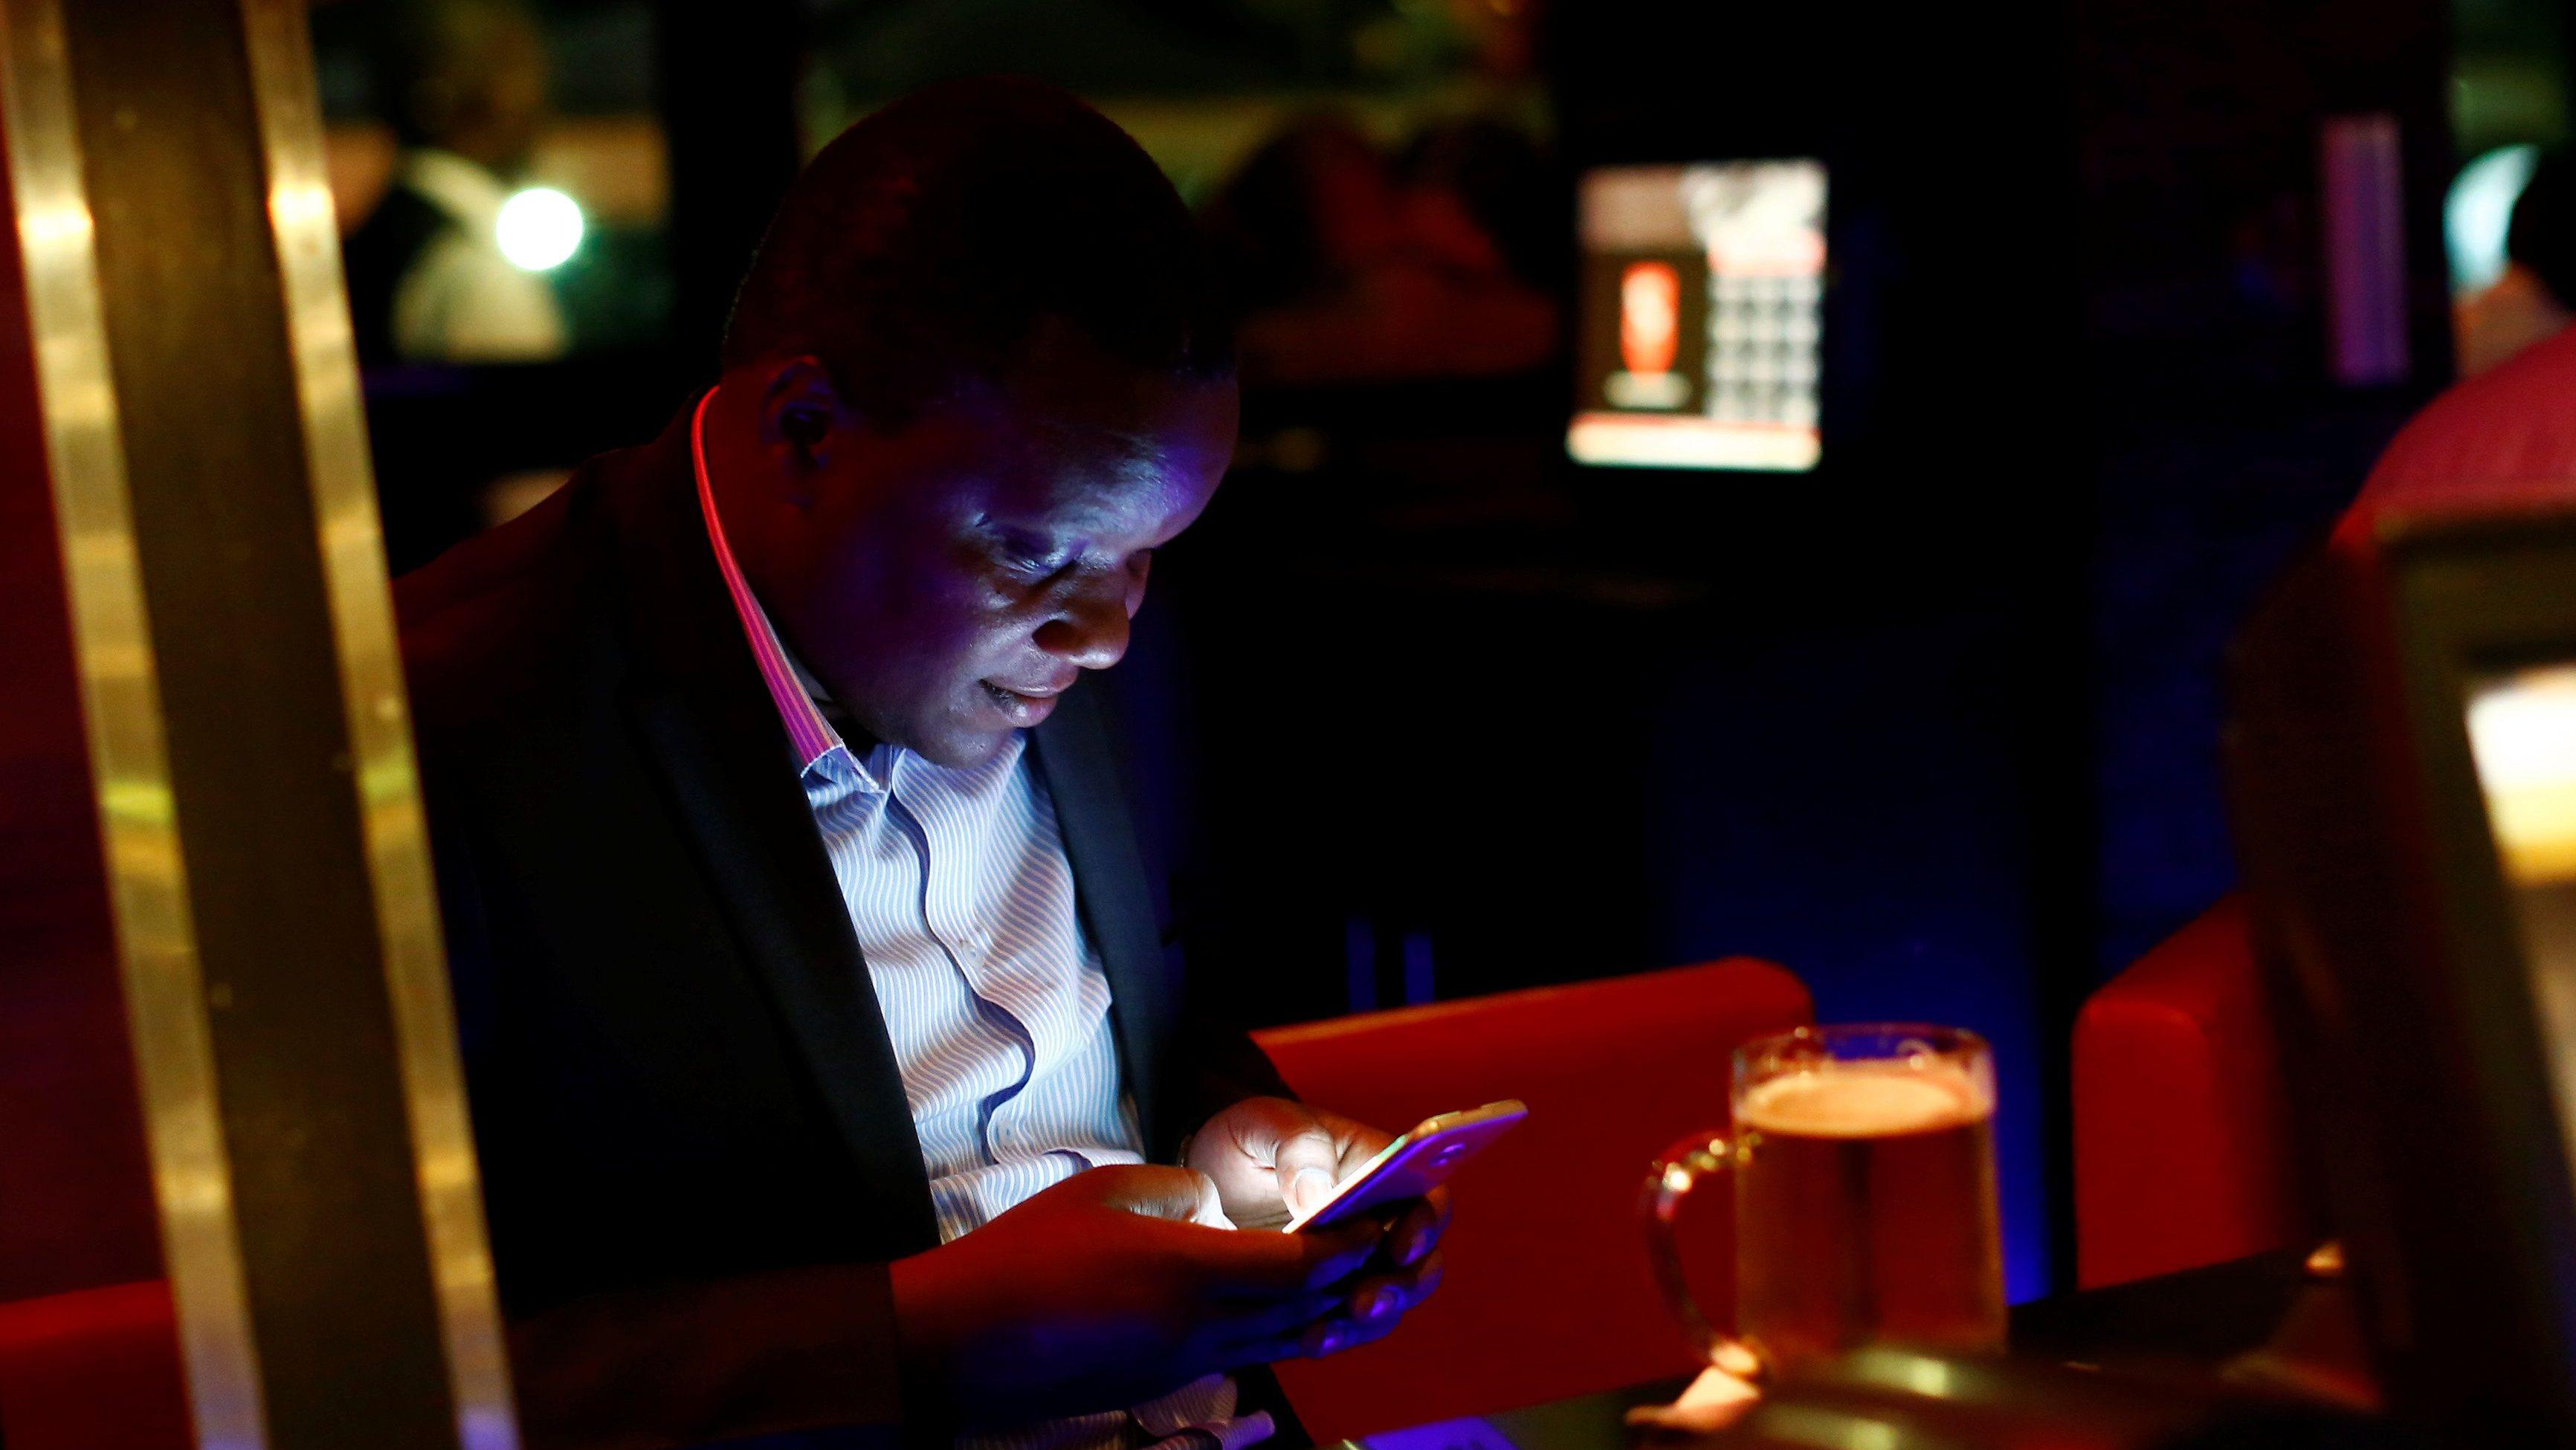 A man uses his mobile phone at the Brew Bistro & Lounge in Nairobi, Kenya, April 13, 2017.